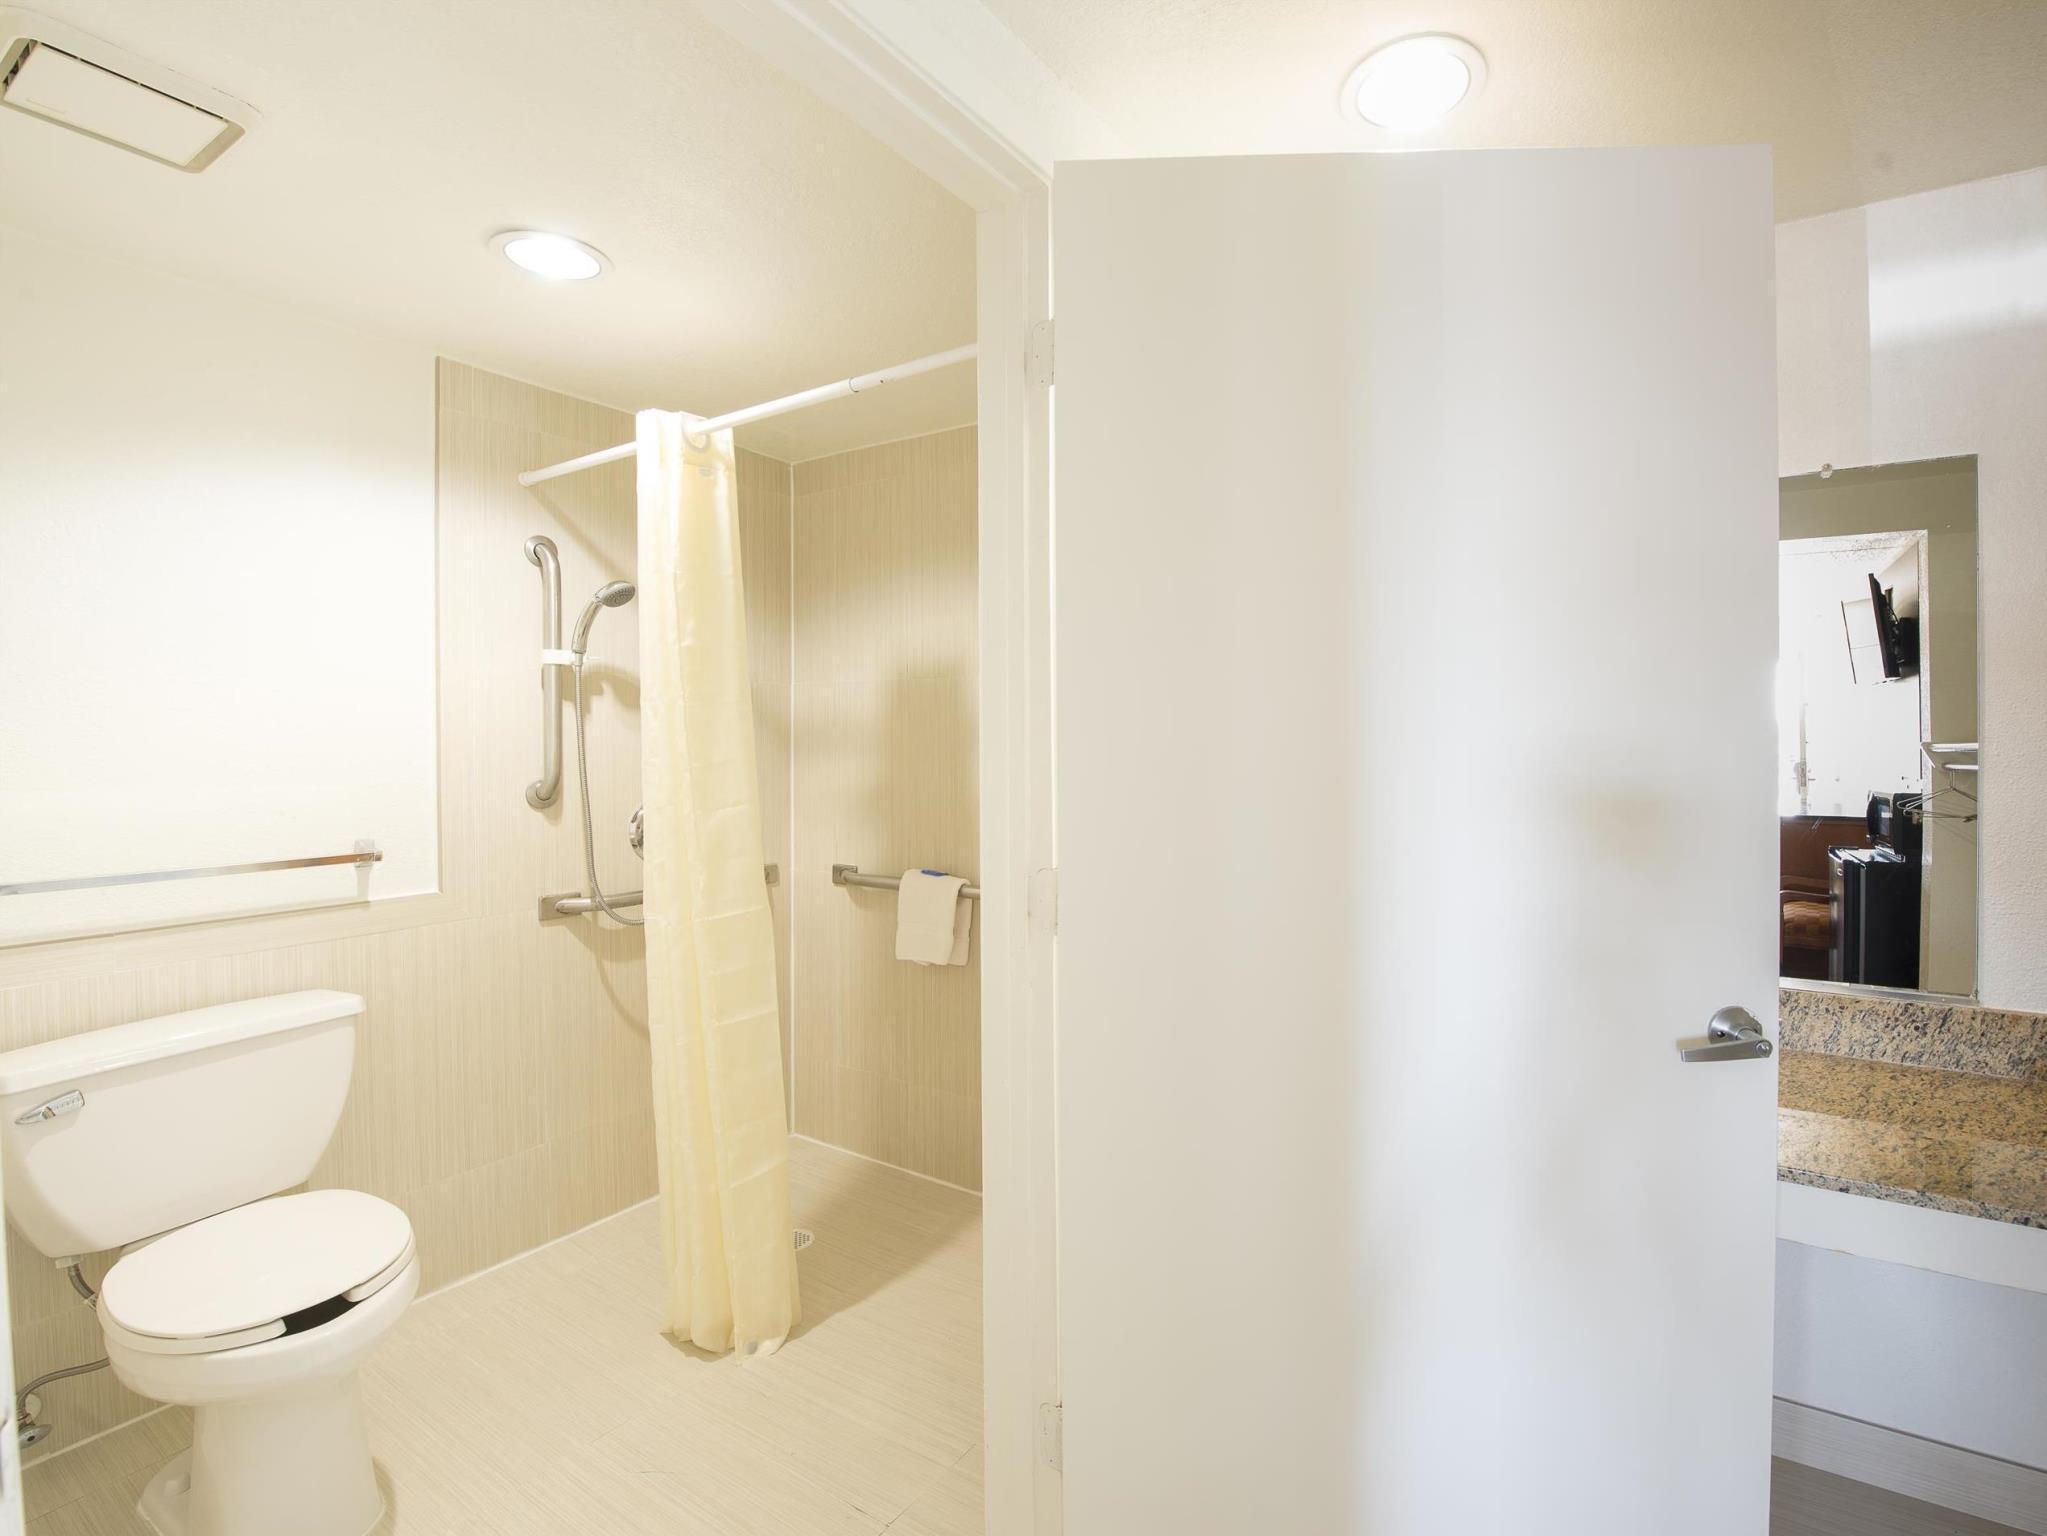 Review New Six Inn & Suites - Houston